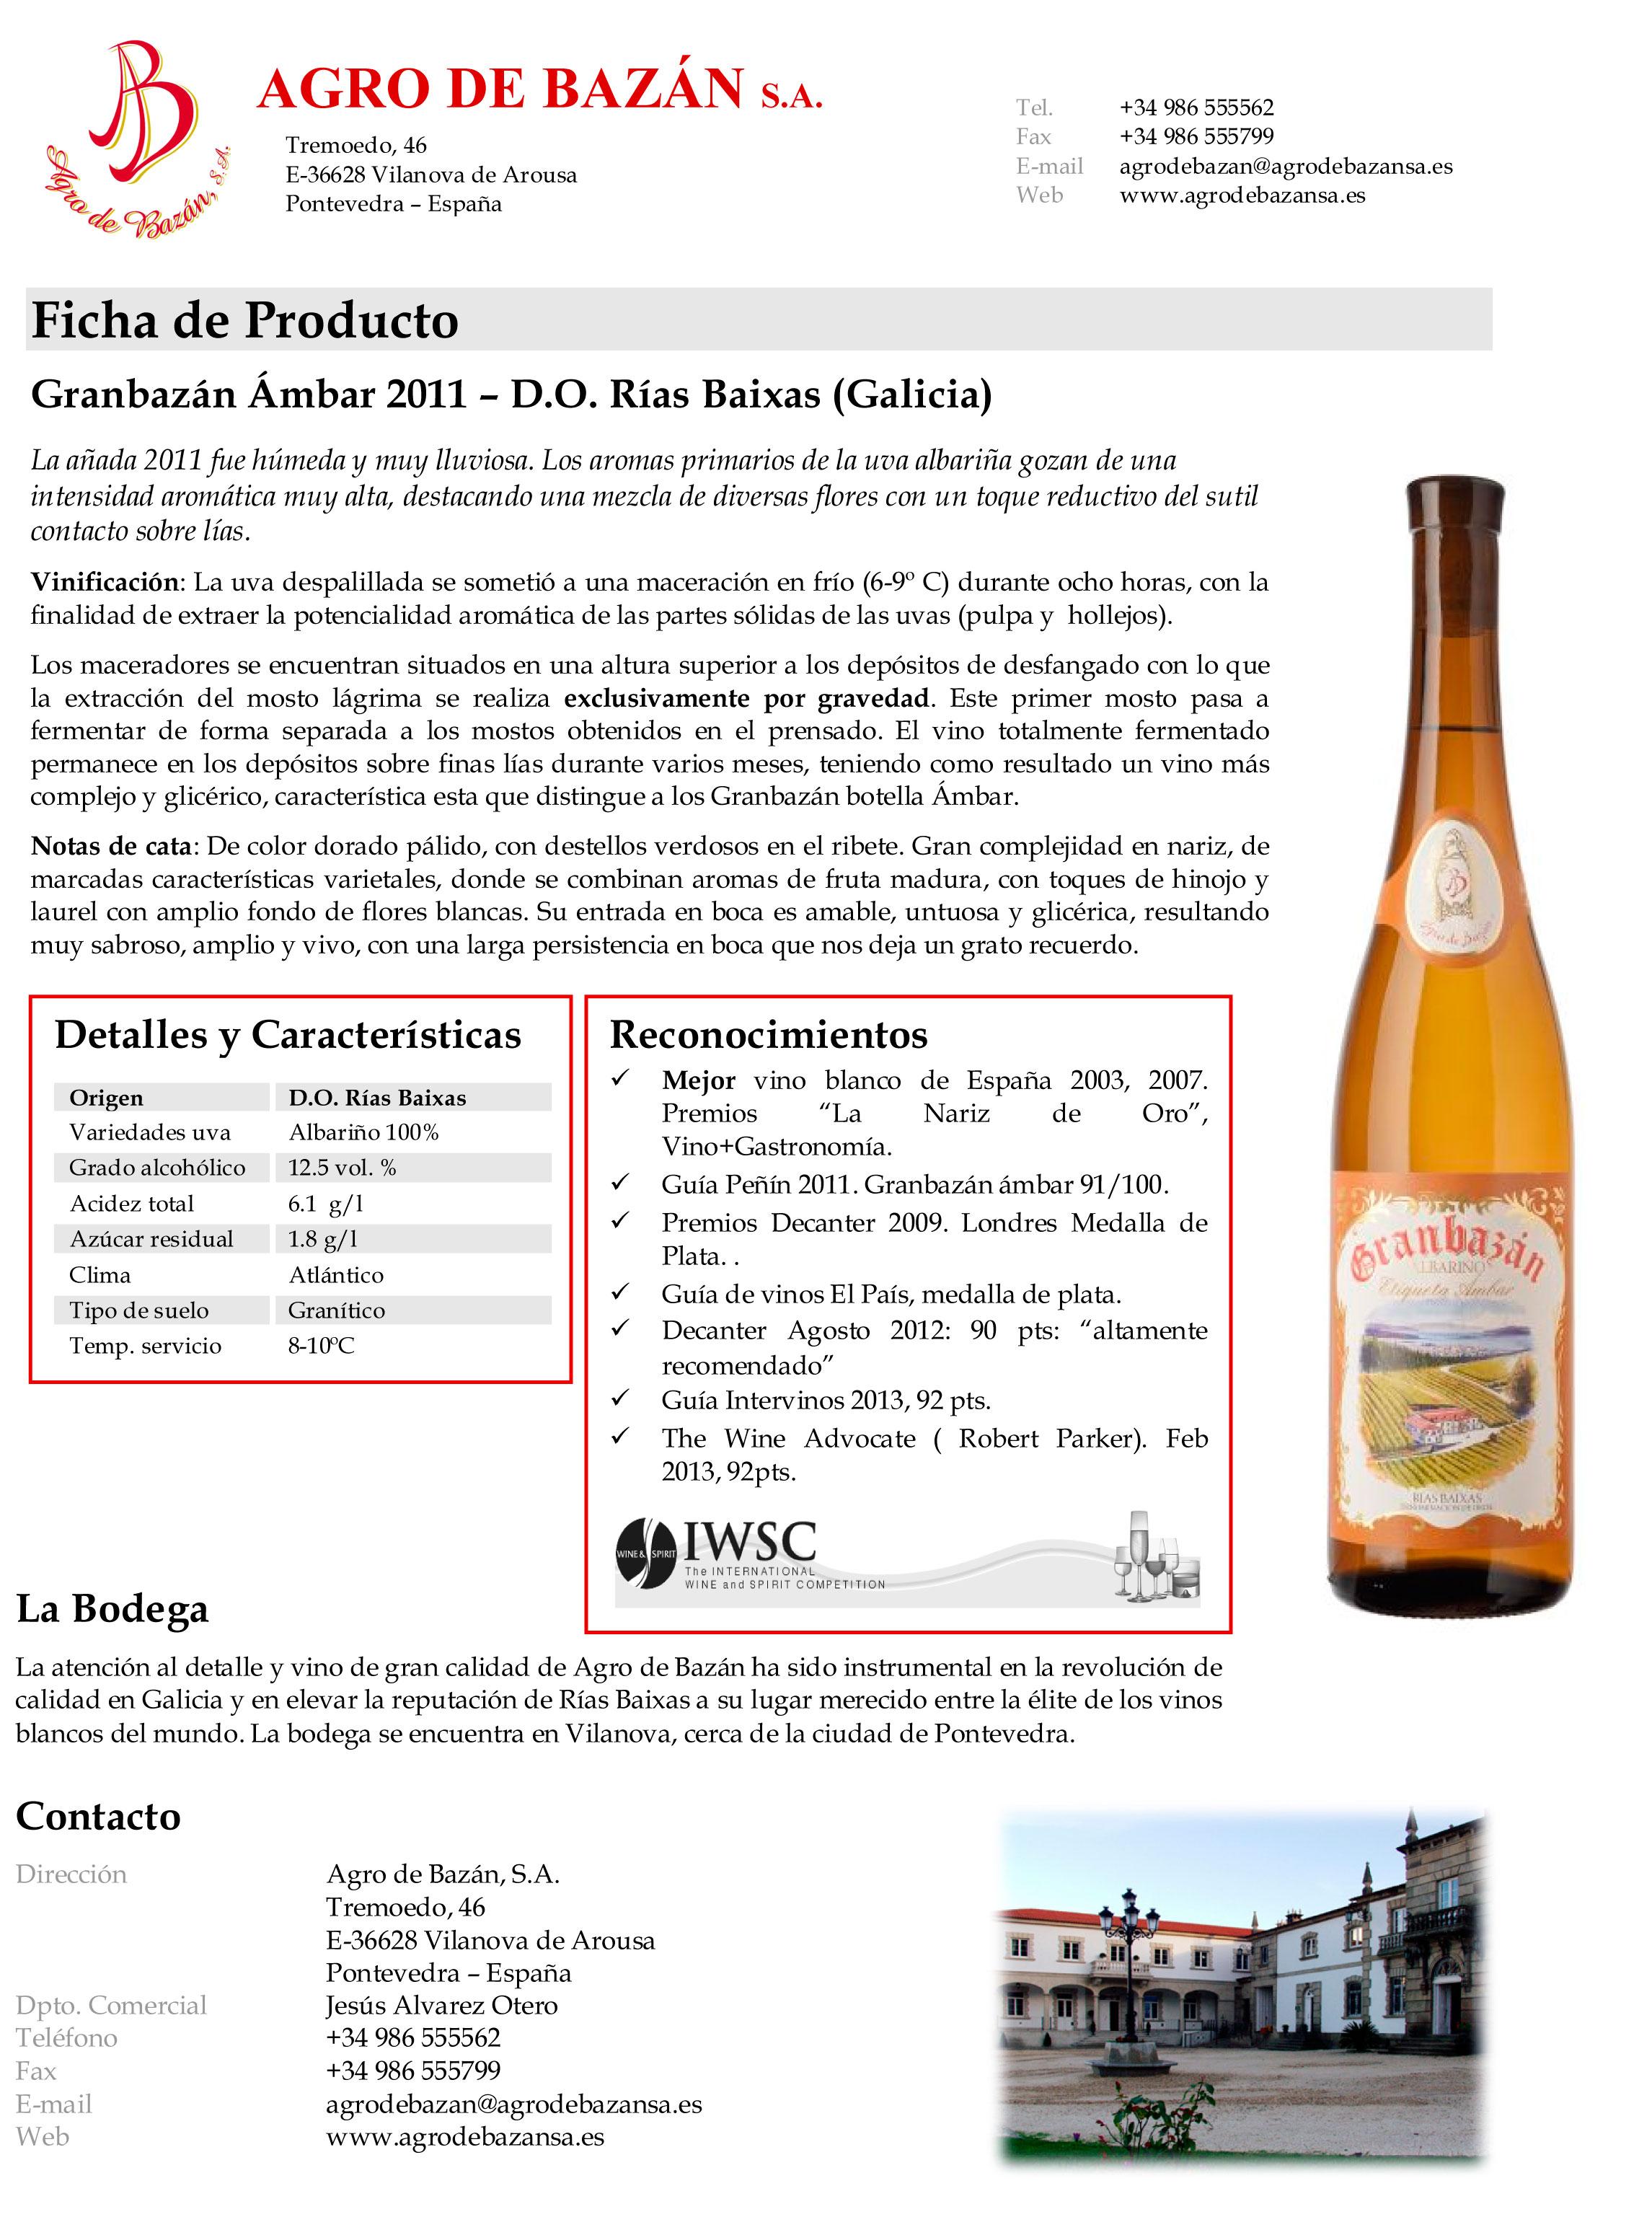 Ficha-Gran-bazán-Ámbar-2011